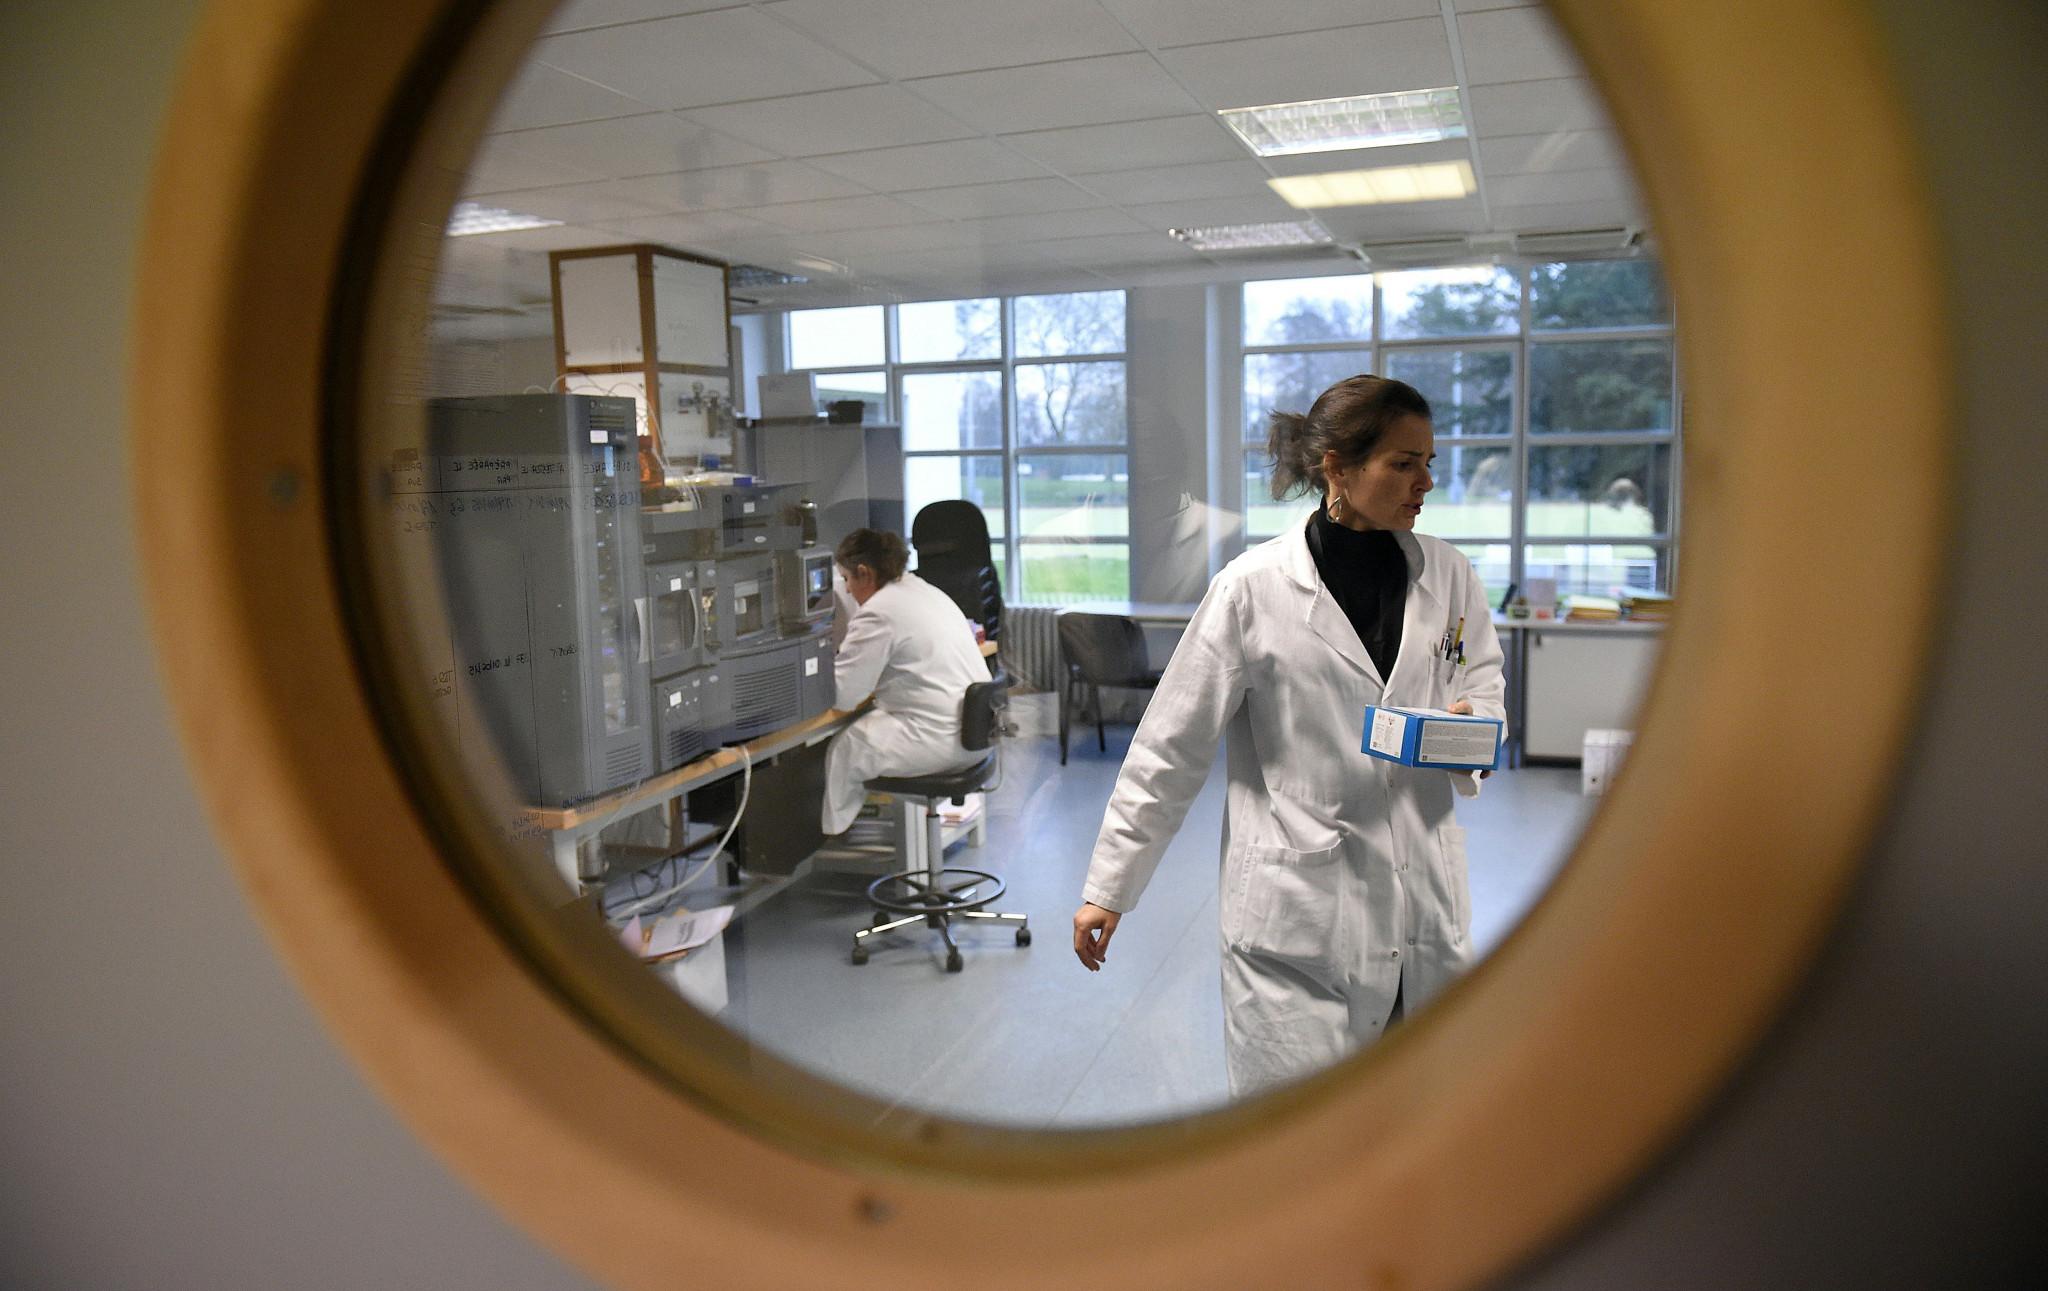 WADA reinstates accreditation of Paris Laboratory